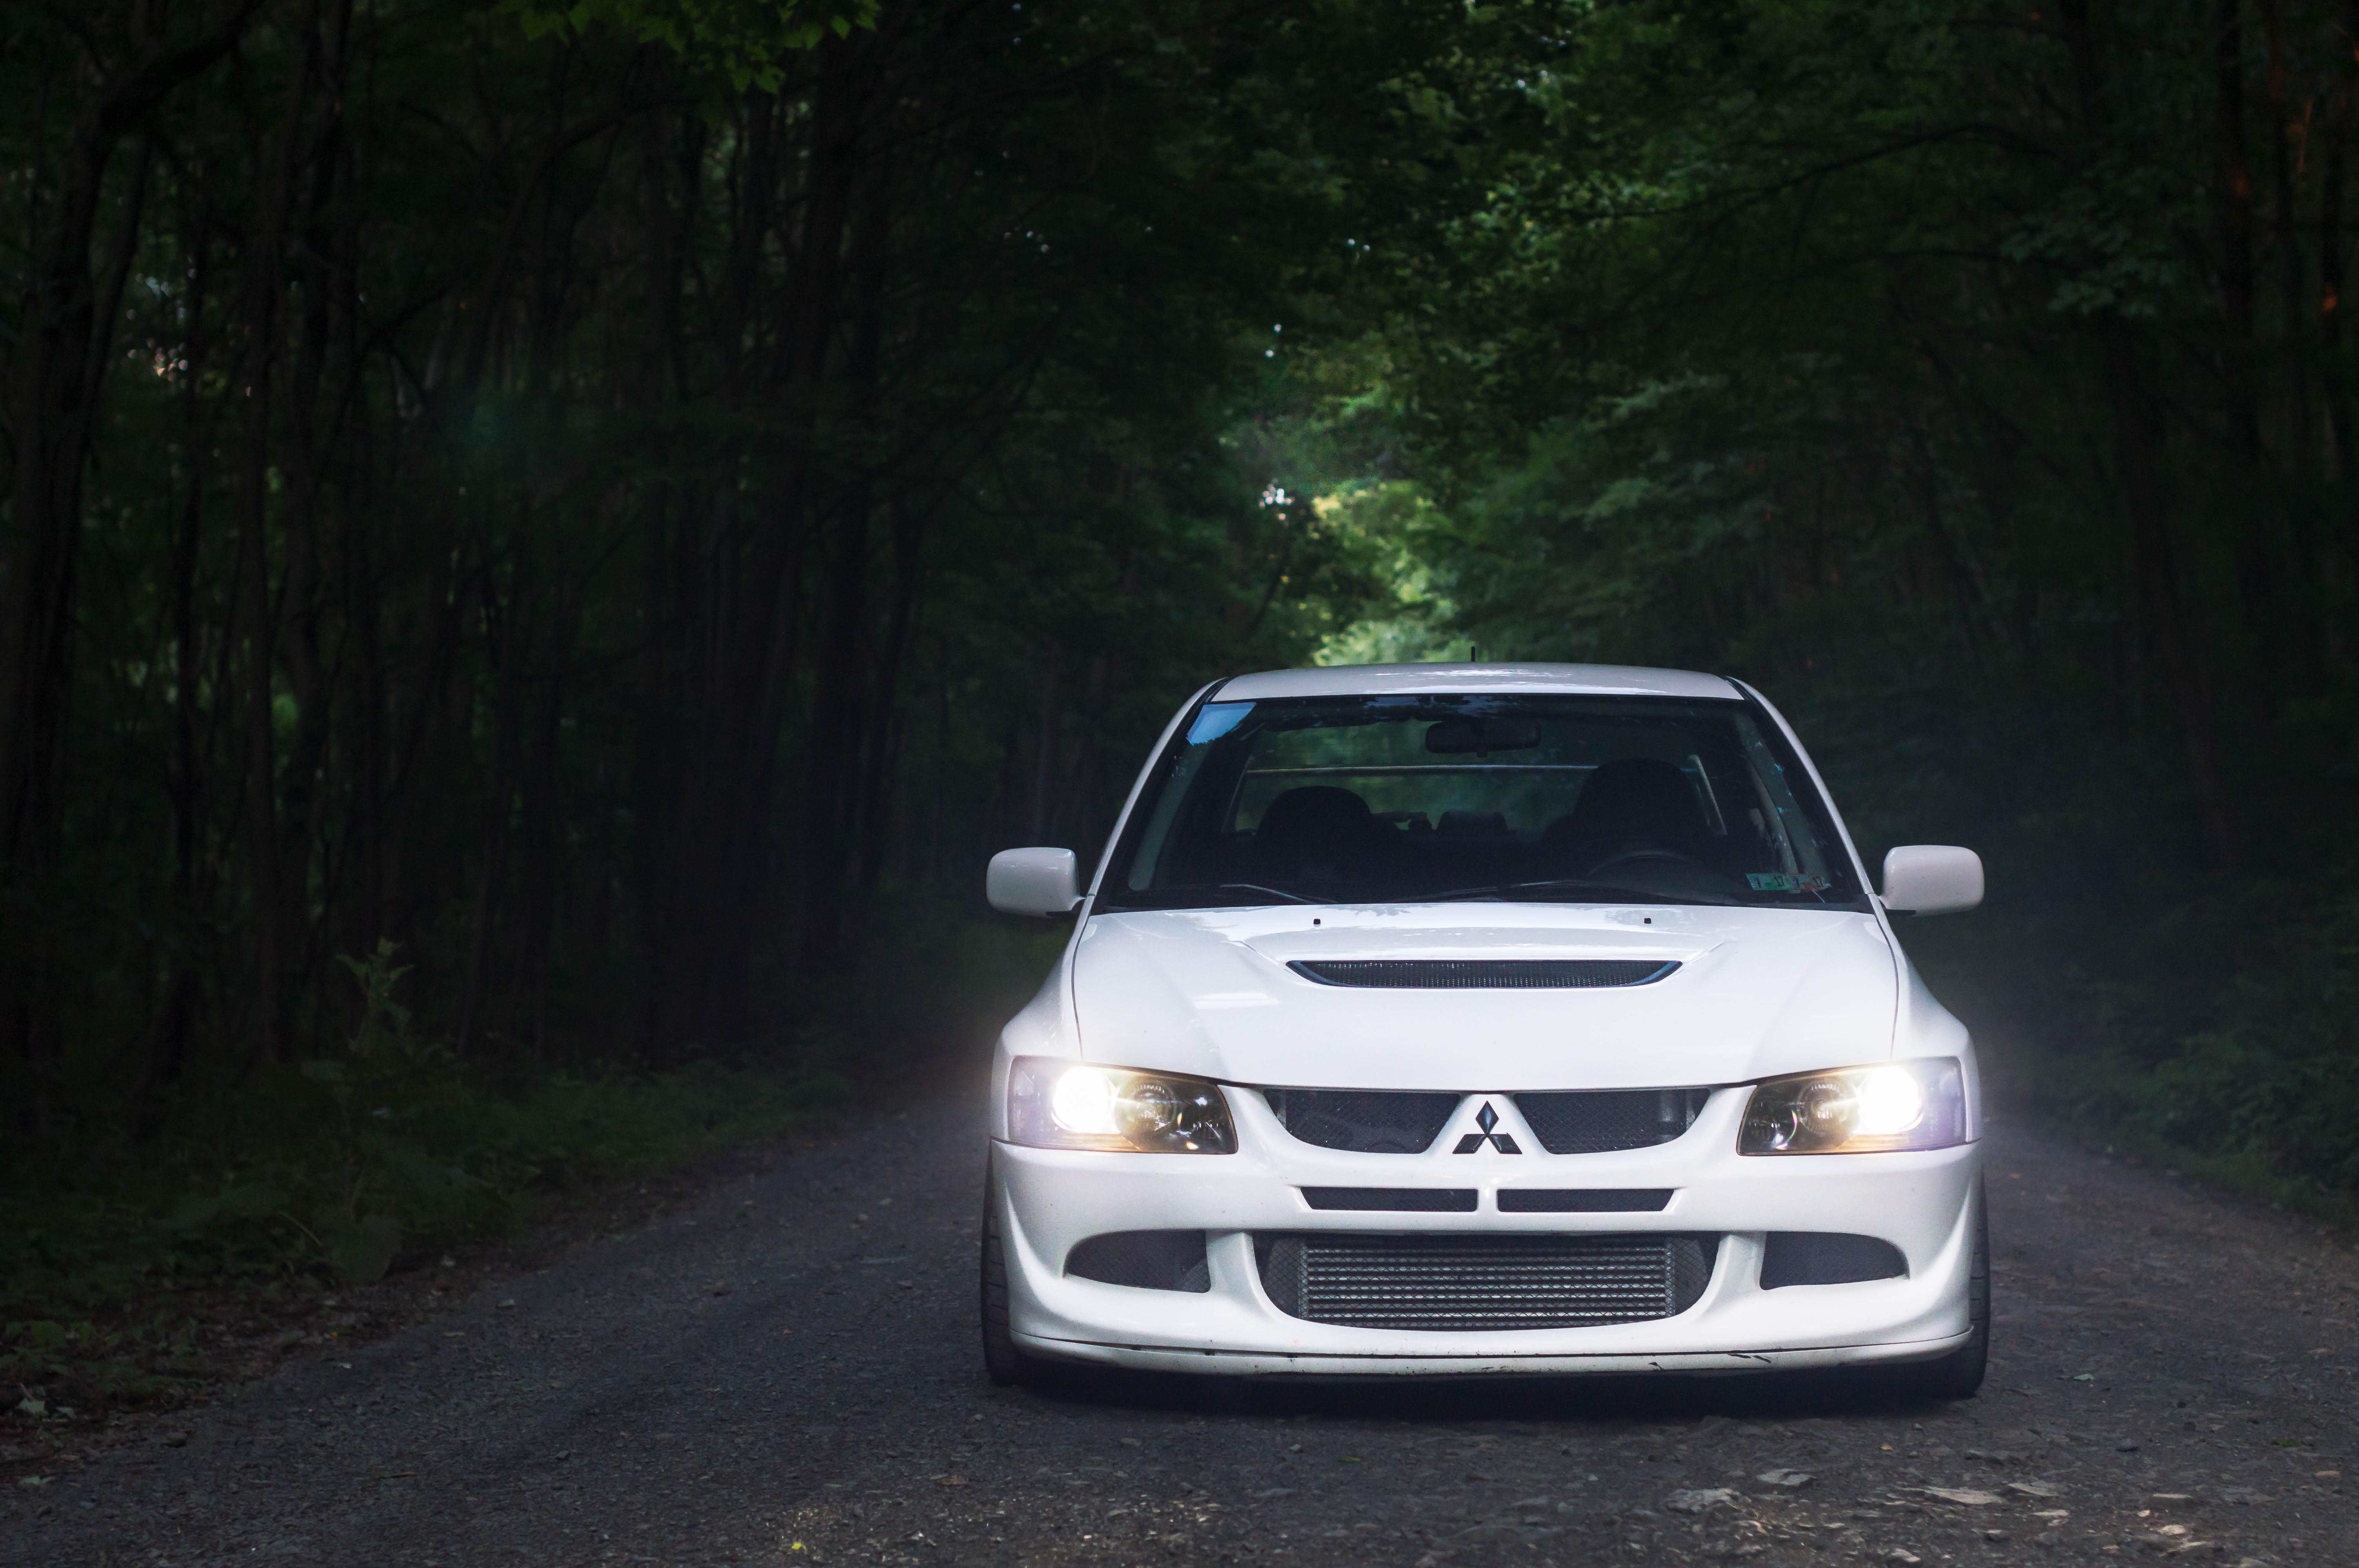 Mitsubishi Lancer Evolution Viii 5k Retina Ultra Hd